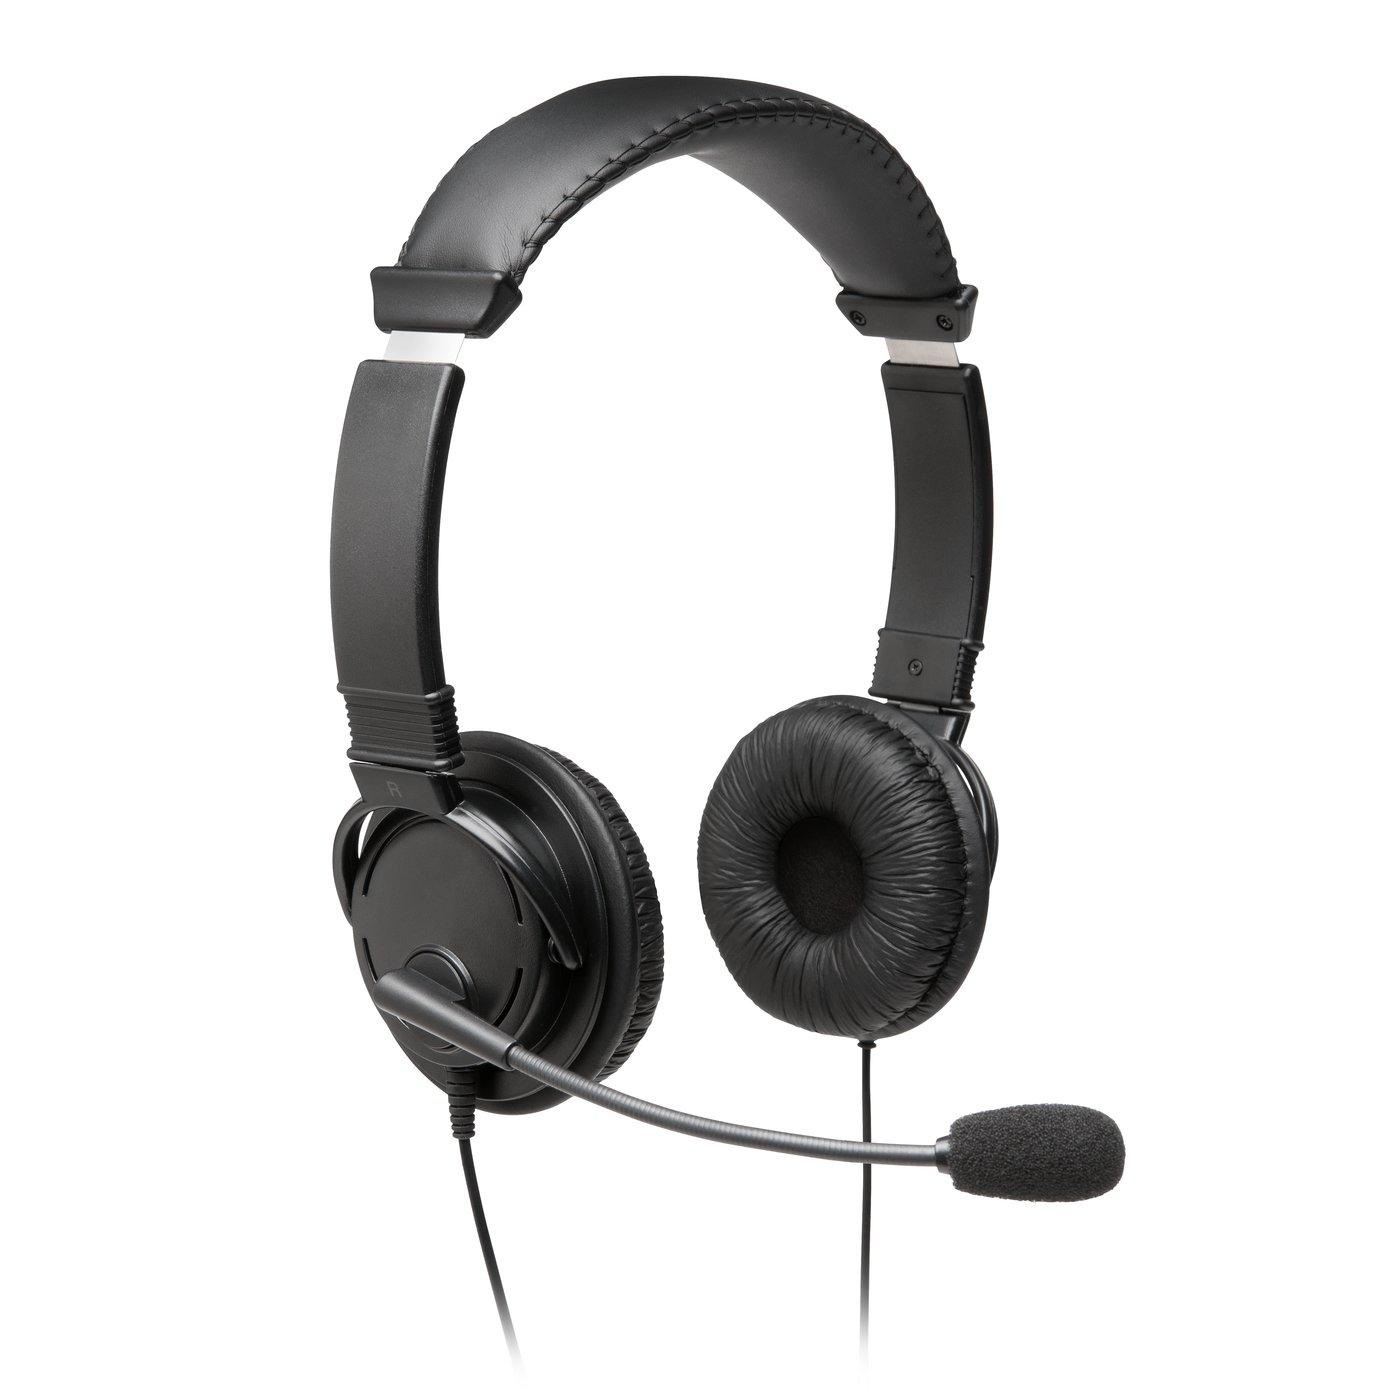 Kensington K97601WW auricular y casco Auriculares Diadema Negro